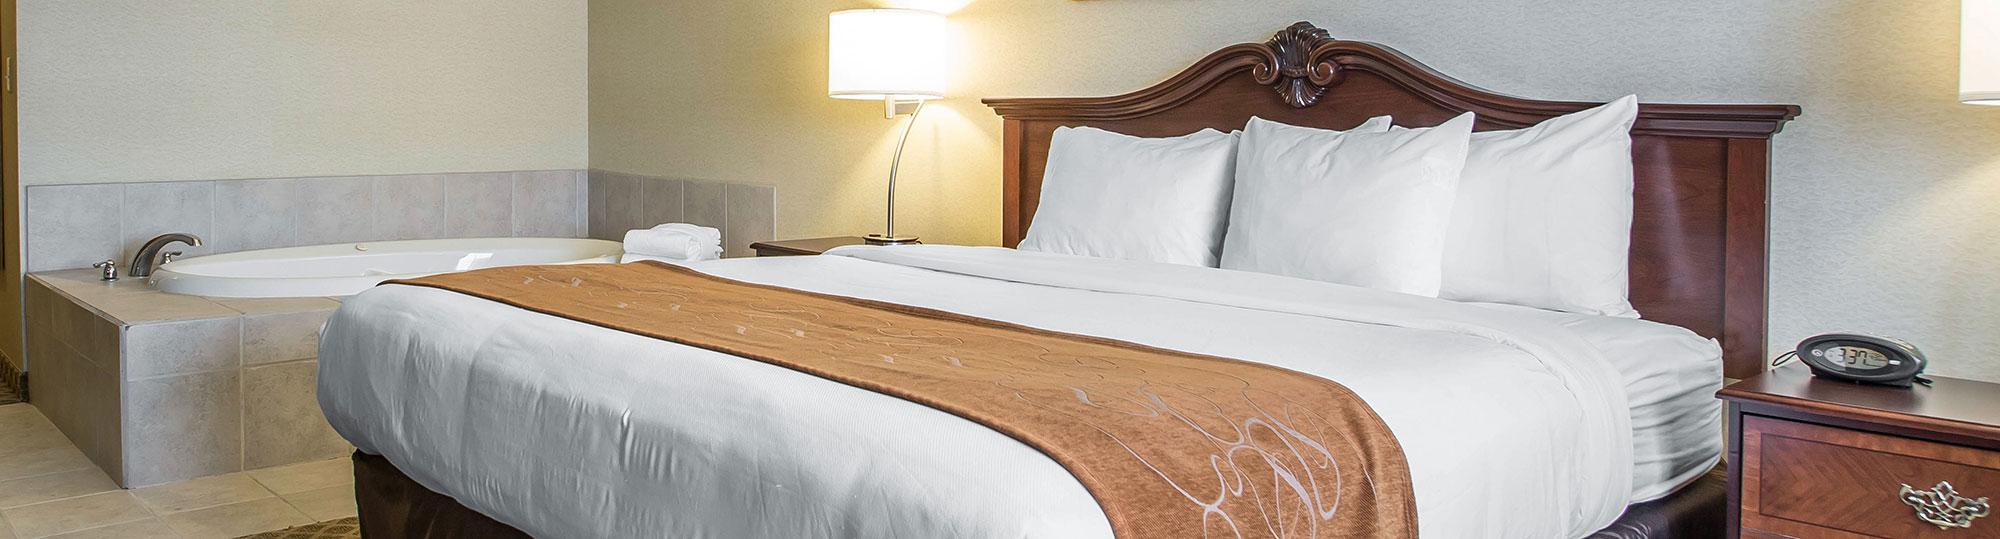 Cobblestone Hotel and Suites Ripon